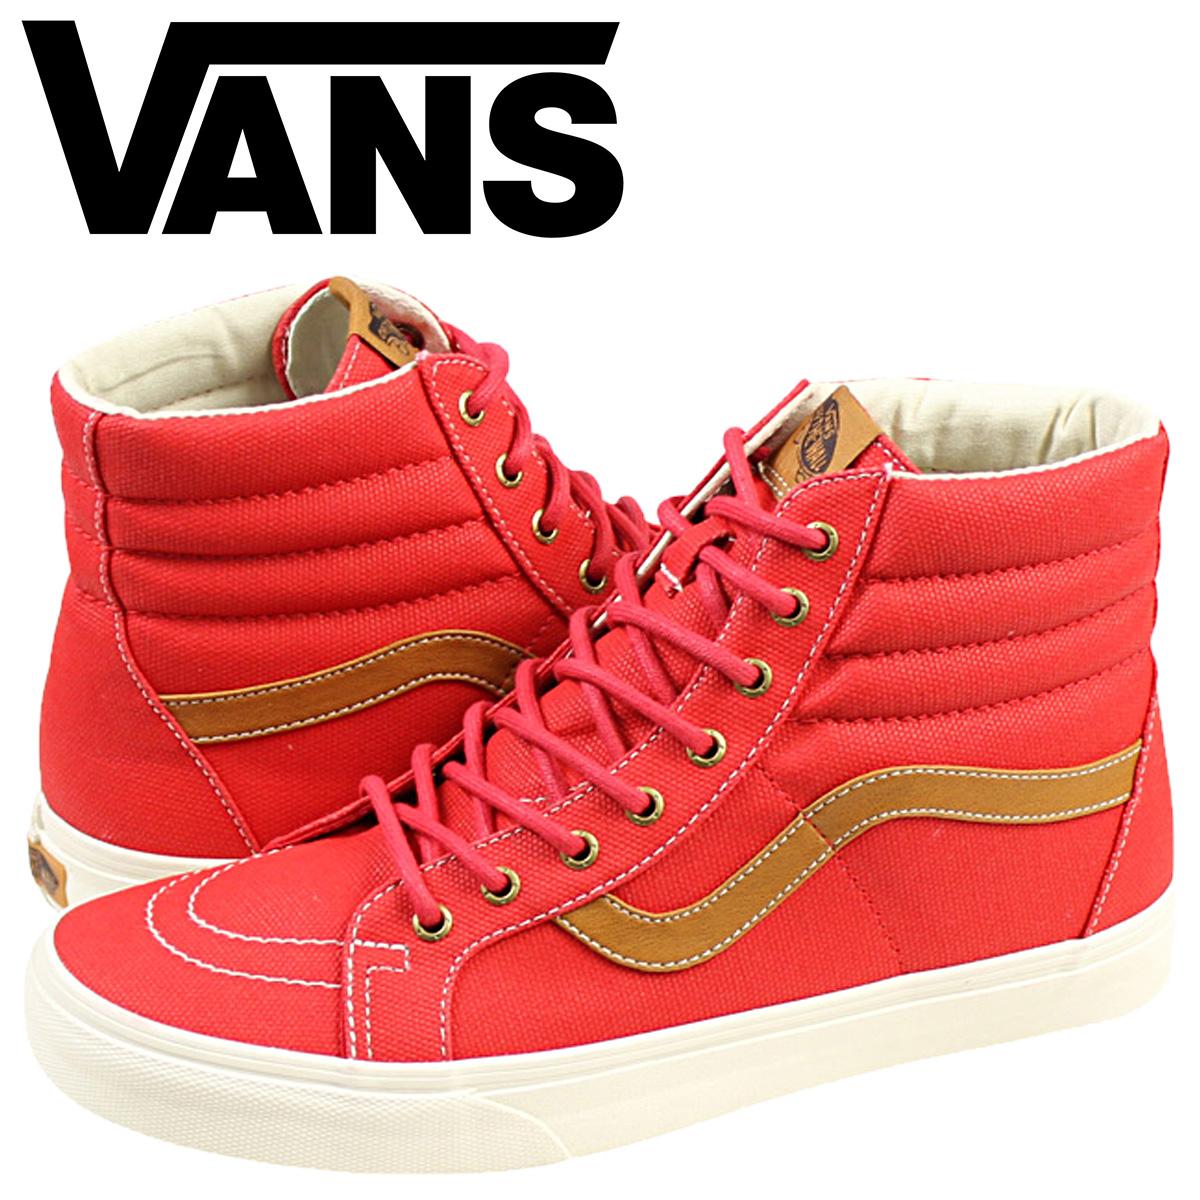 972f83abf5 Sugar Online Shop  Point 5 x vans VANS SK8-HI REISSUE Hi sneakers Skate  reissue canvas men s VN-0QG2DTN formula one